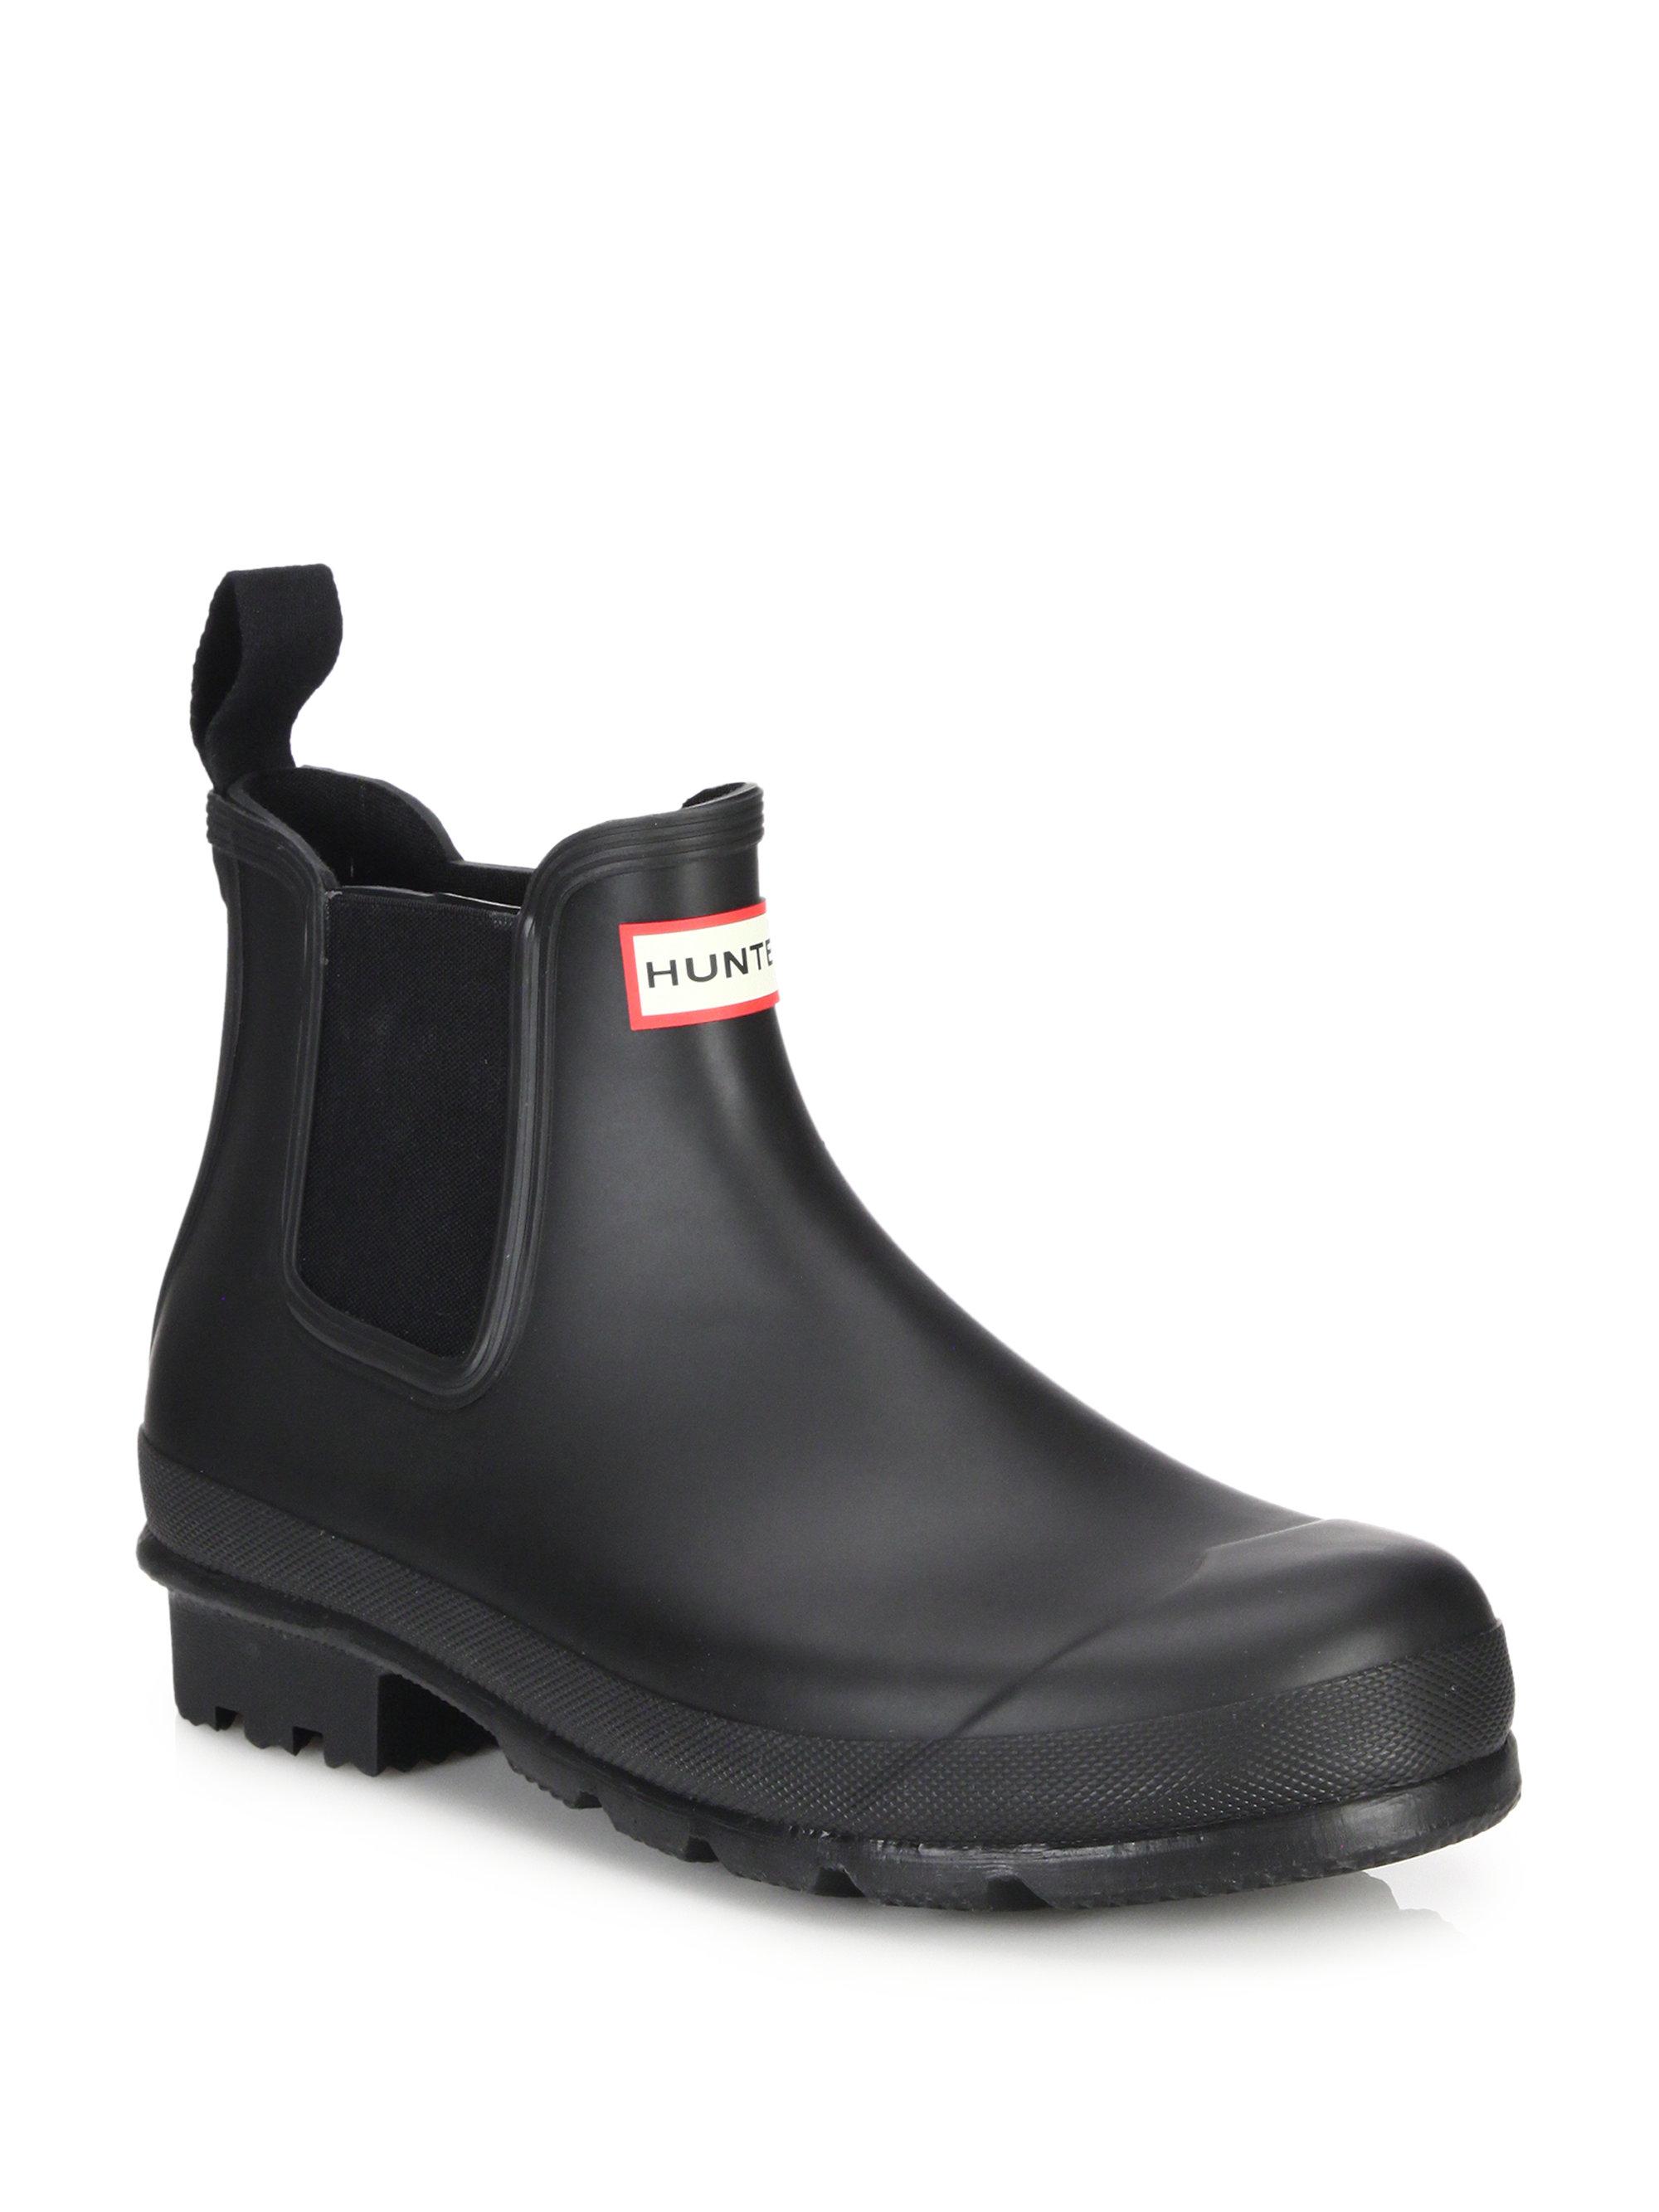 Hunter Rain Shoes Sale